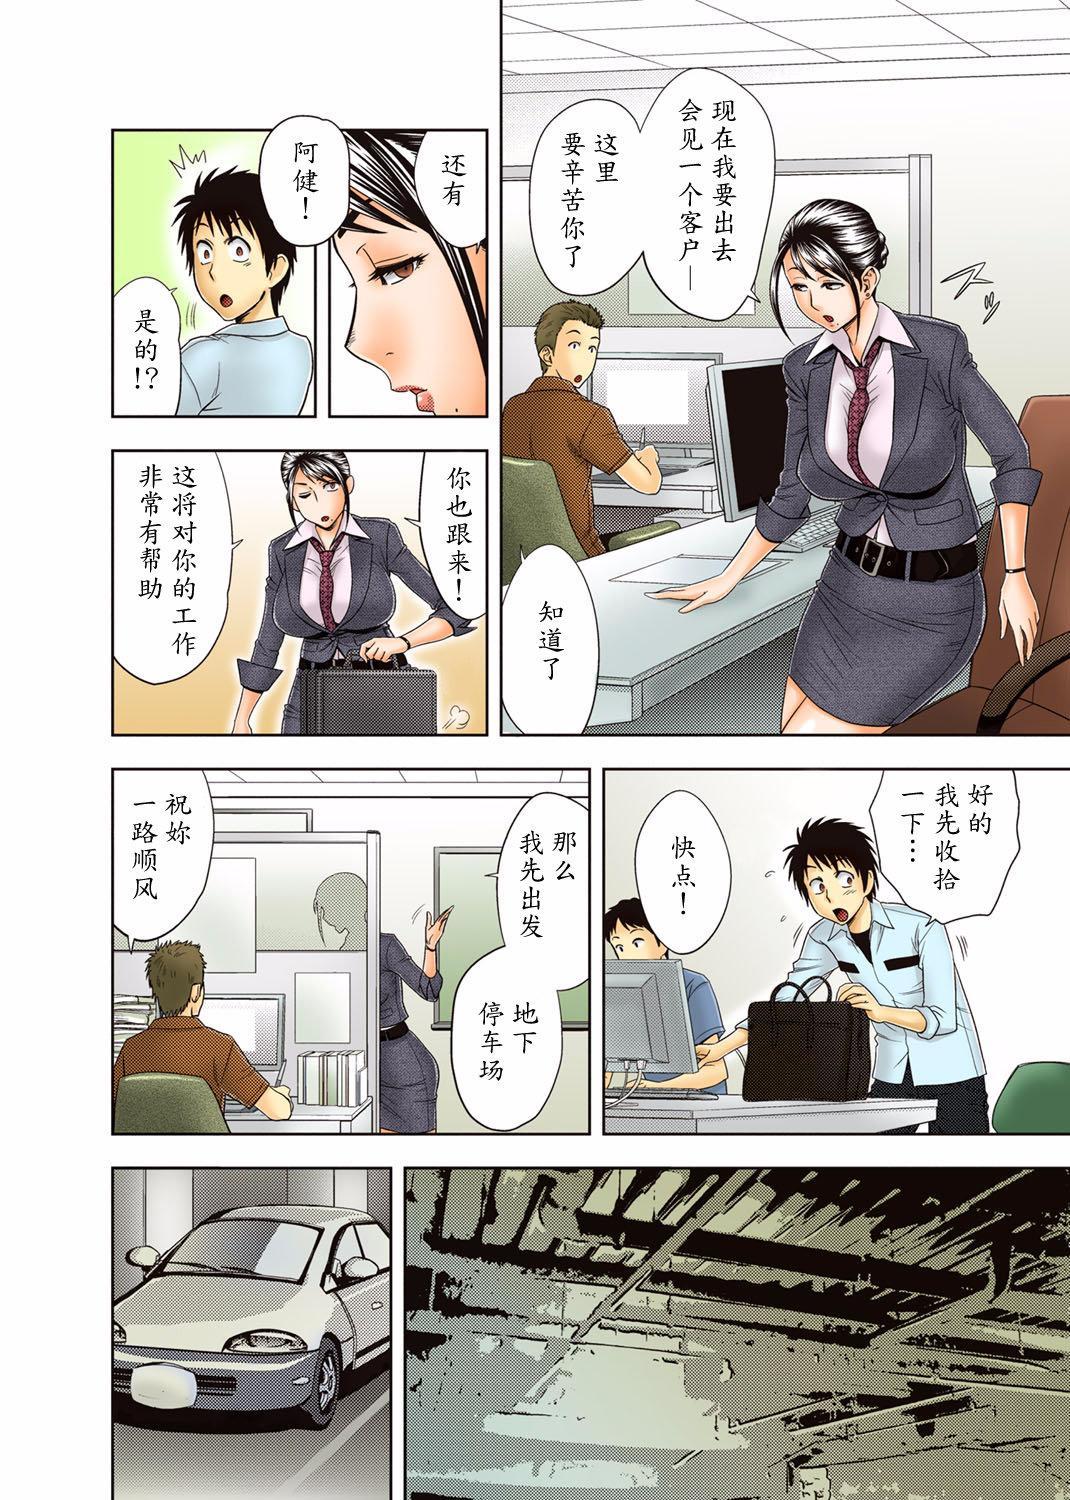 [Madam Project (Tatsunami Youtoku)] Aaan Mucchiri Kyonyuu Onee-san ~Uchiawase de Good Job!~ | Hmmm My Older Sister's Big and Plump Tits ~Good Job at the Meeting!~ [Chinese] [魔劍个人汉化] [Decensored] [Digital] 1